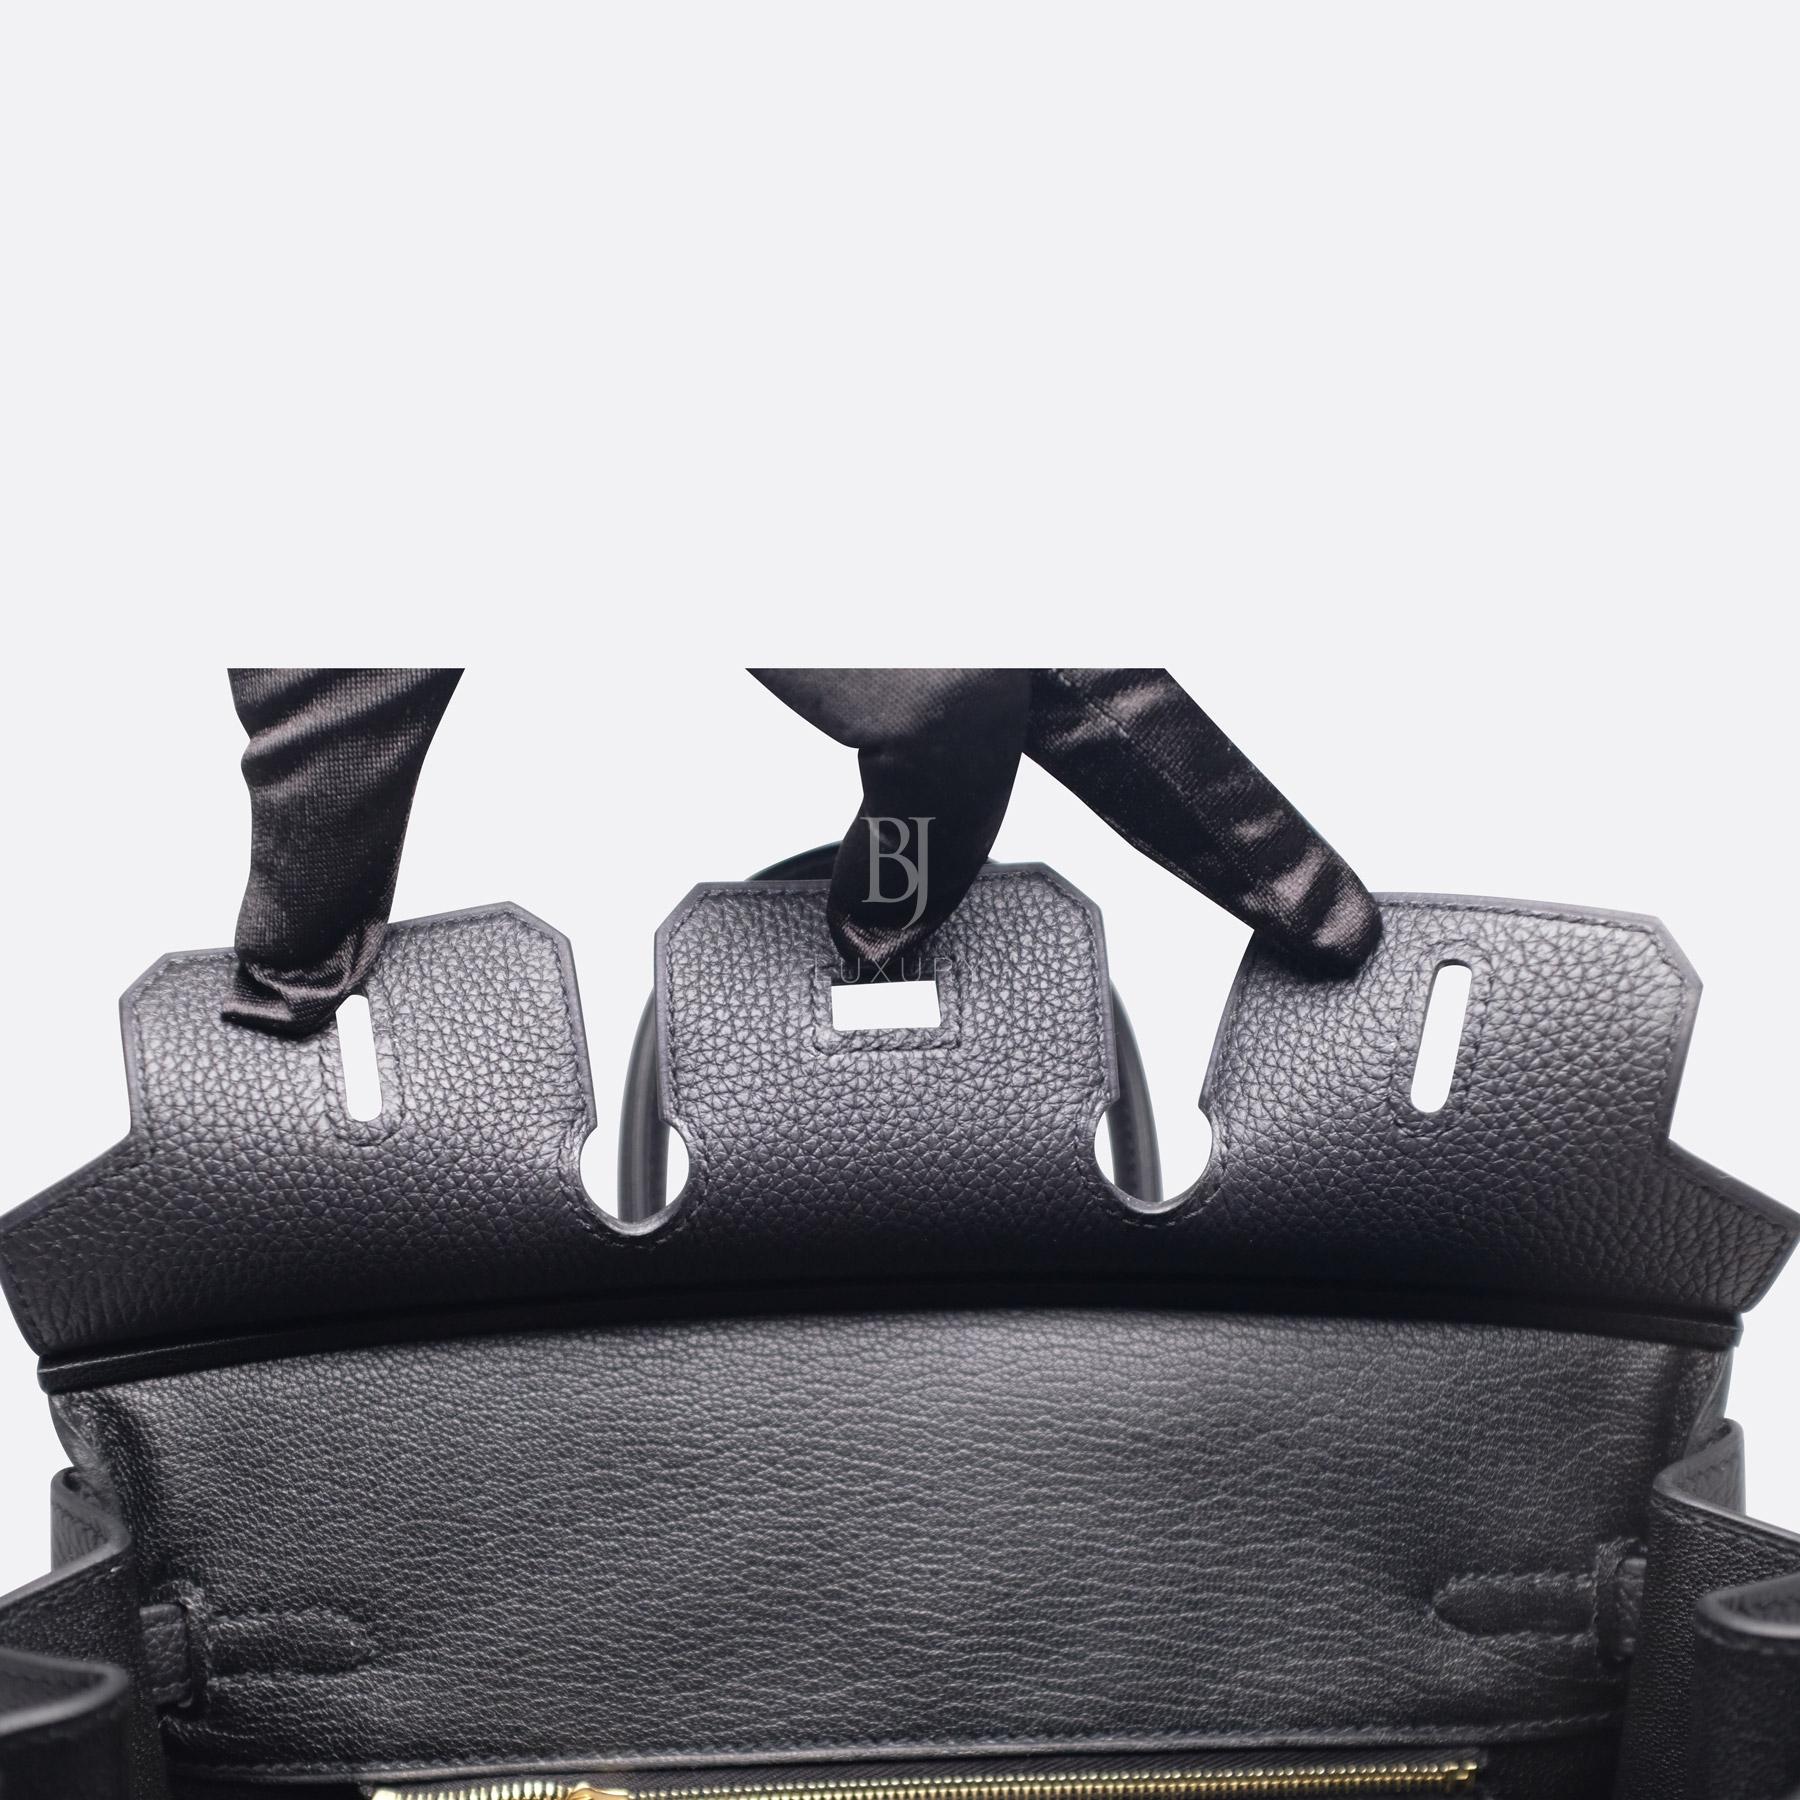 Hermes Birkin 25 Black Togo Gold Hardware BJ Luxury 2.jpg